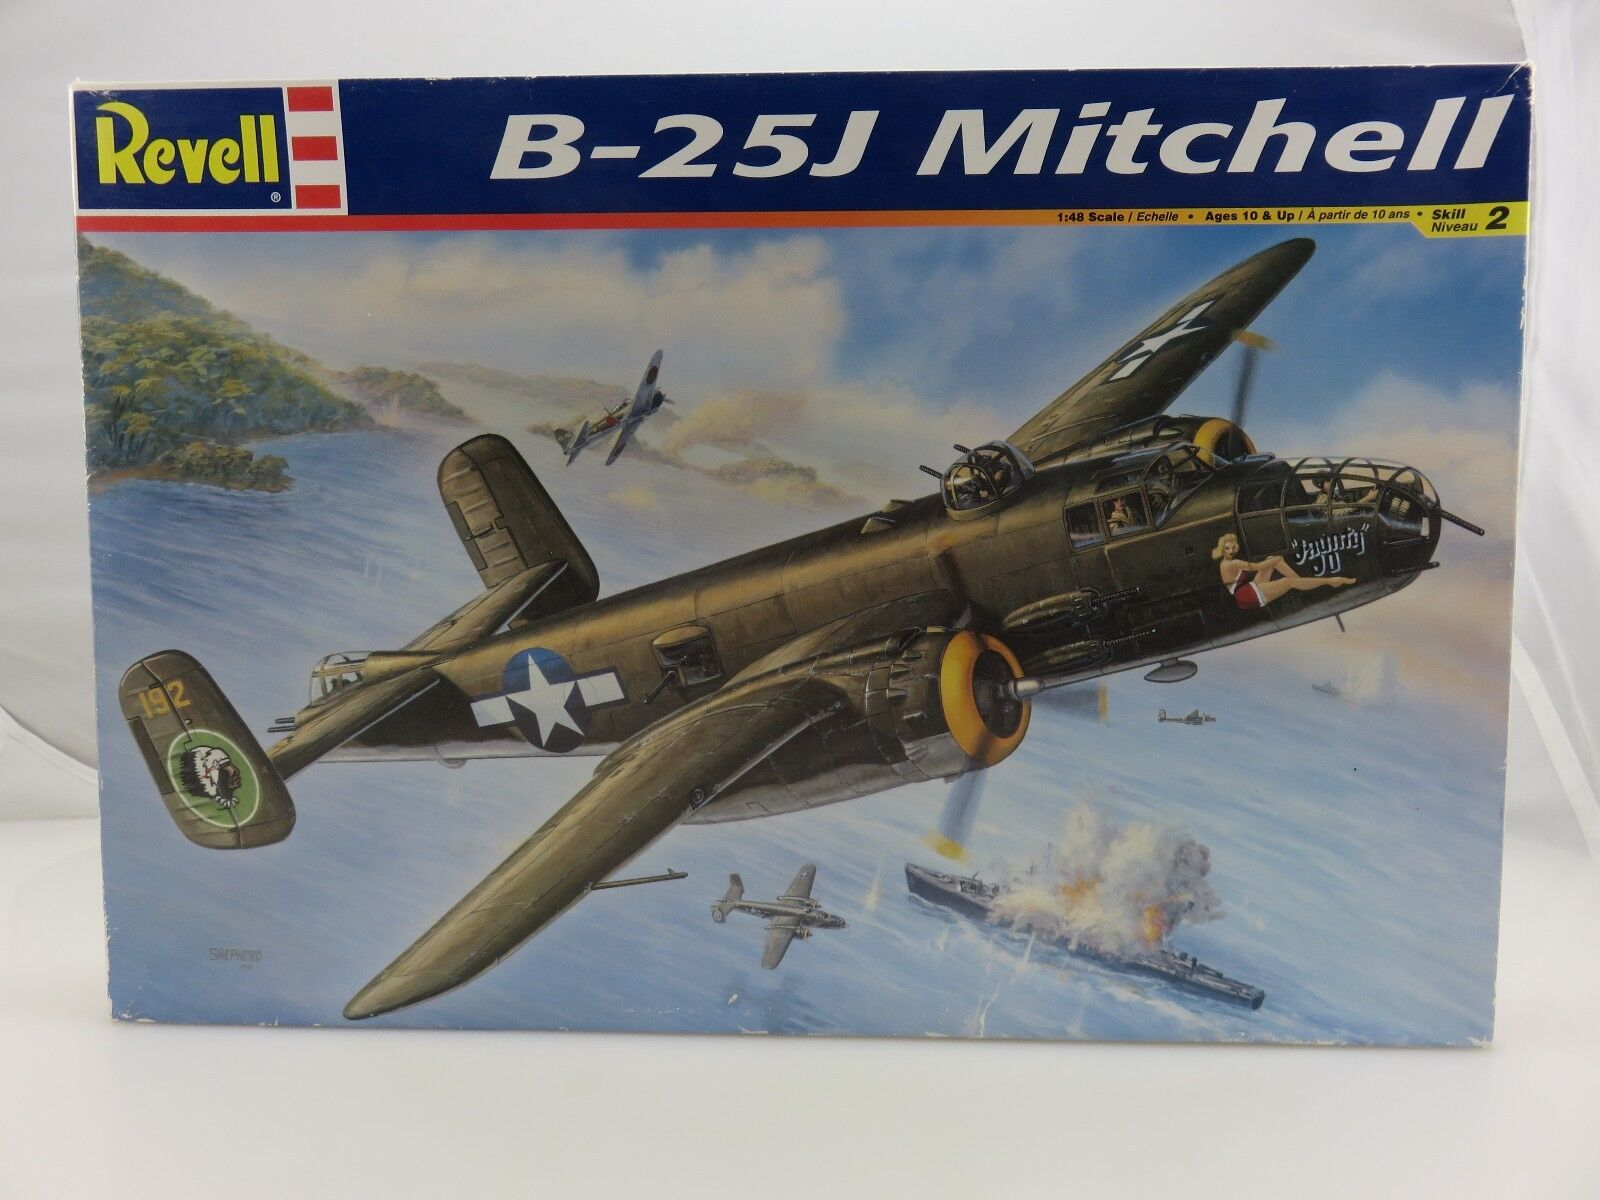 Revell B-25J MITCHELL 1 48 Scale Plastic Model Kit UNBUILT 2004